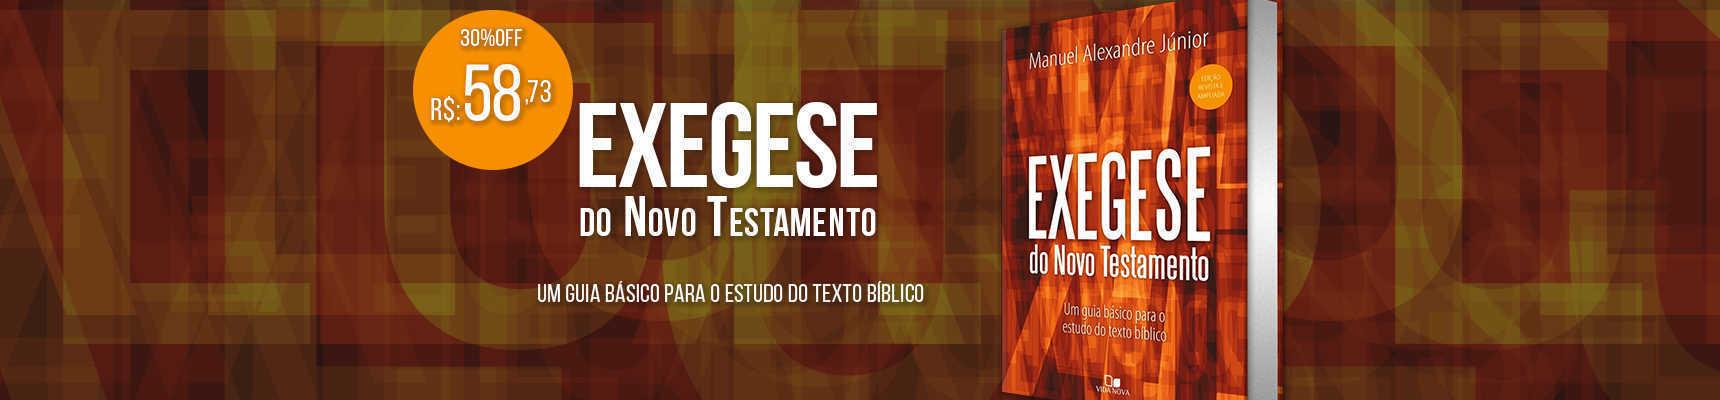 exegese-do-nt